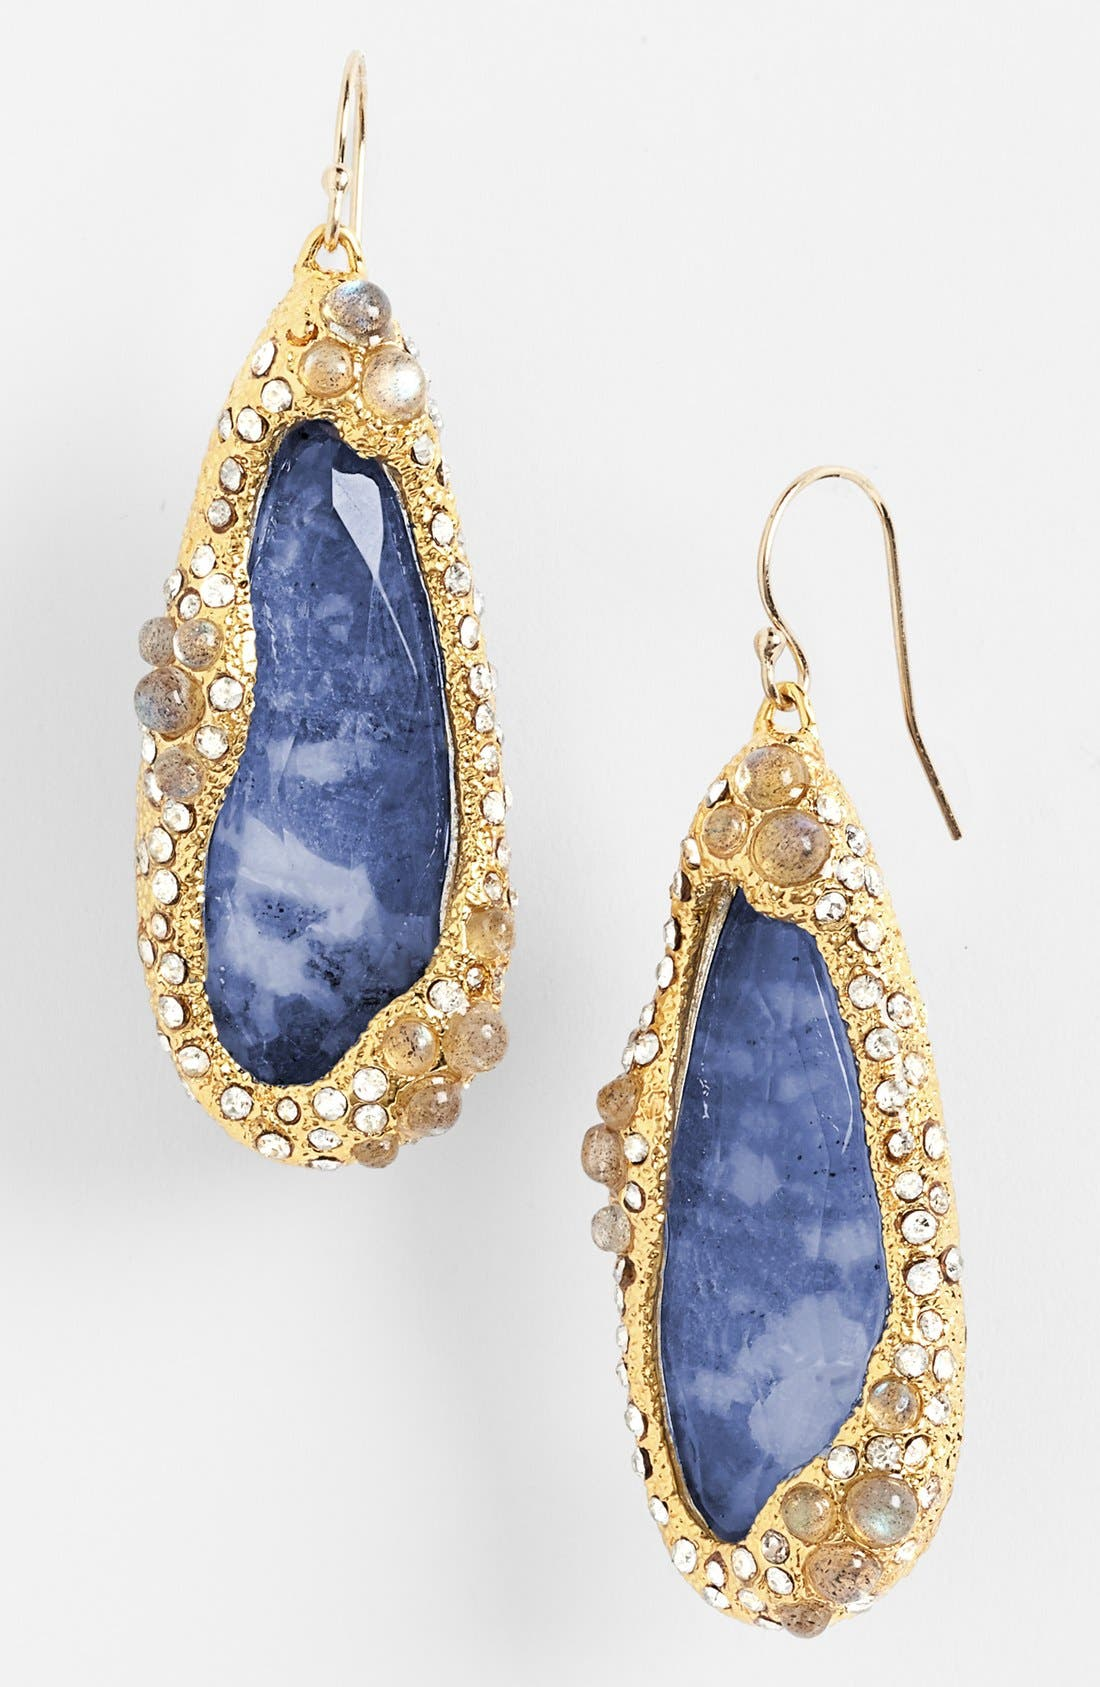 Alternate Image 1 Selected - Alexis Bittar 'Elements - Jardin de Papillon' Teardrop Earrings